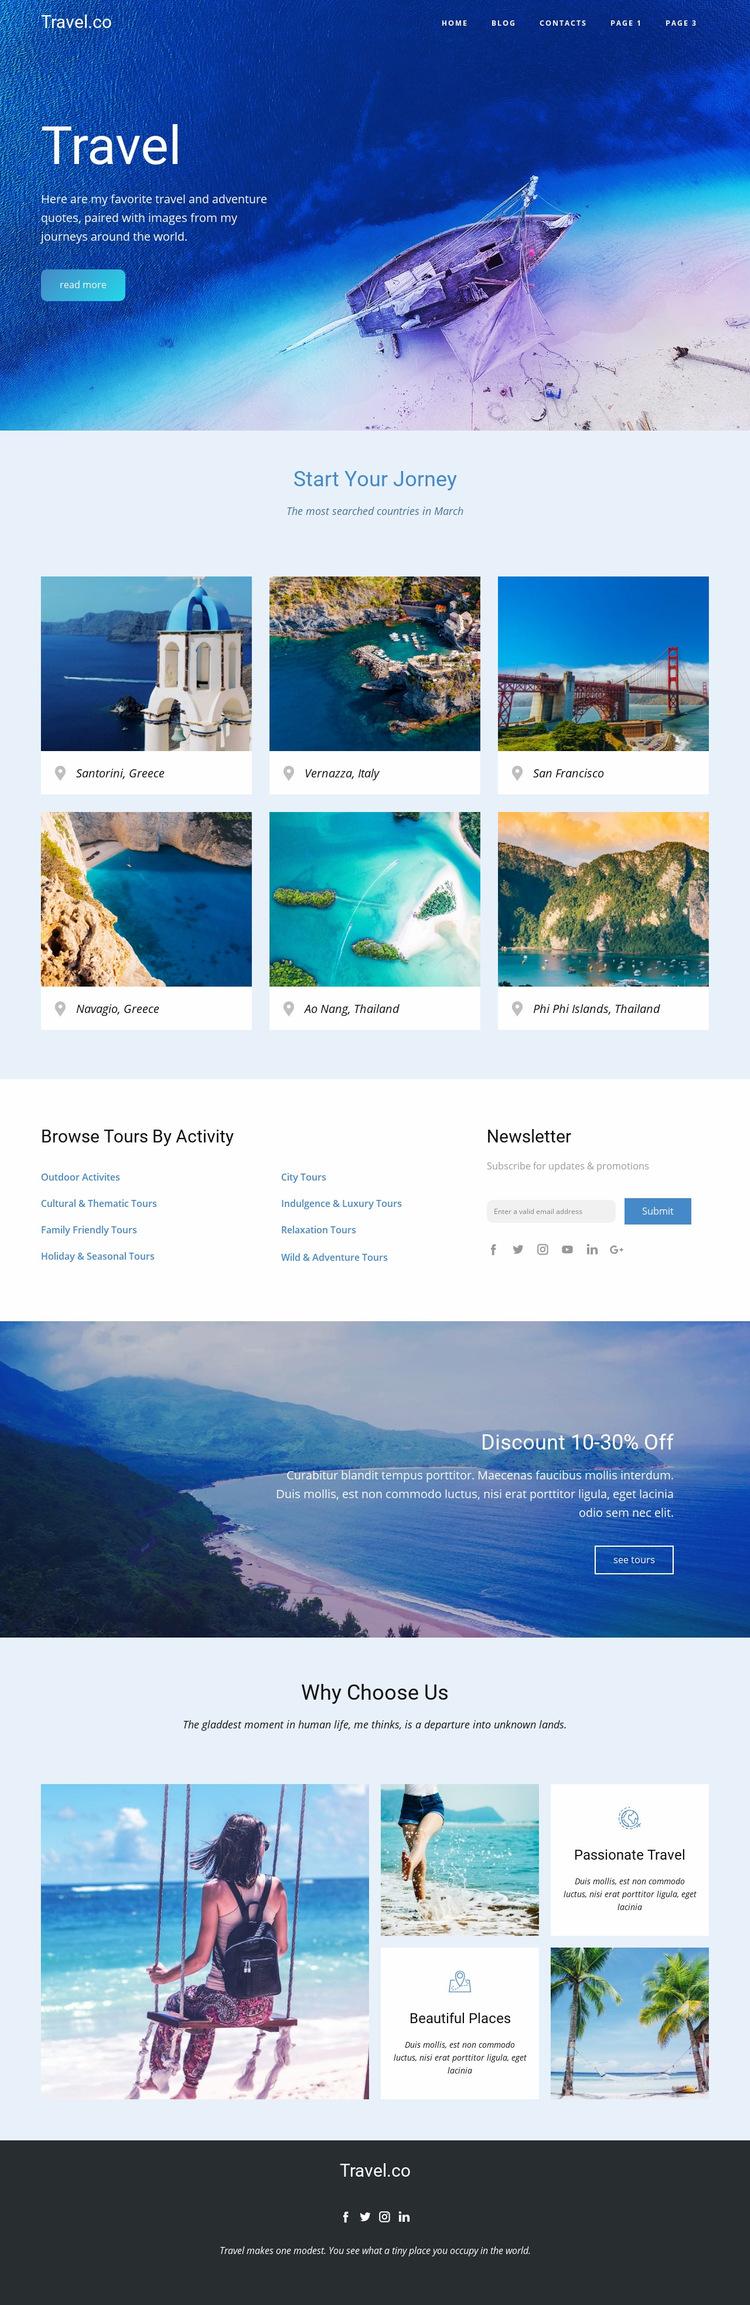 Amazing ideas for travel WordPress Website